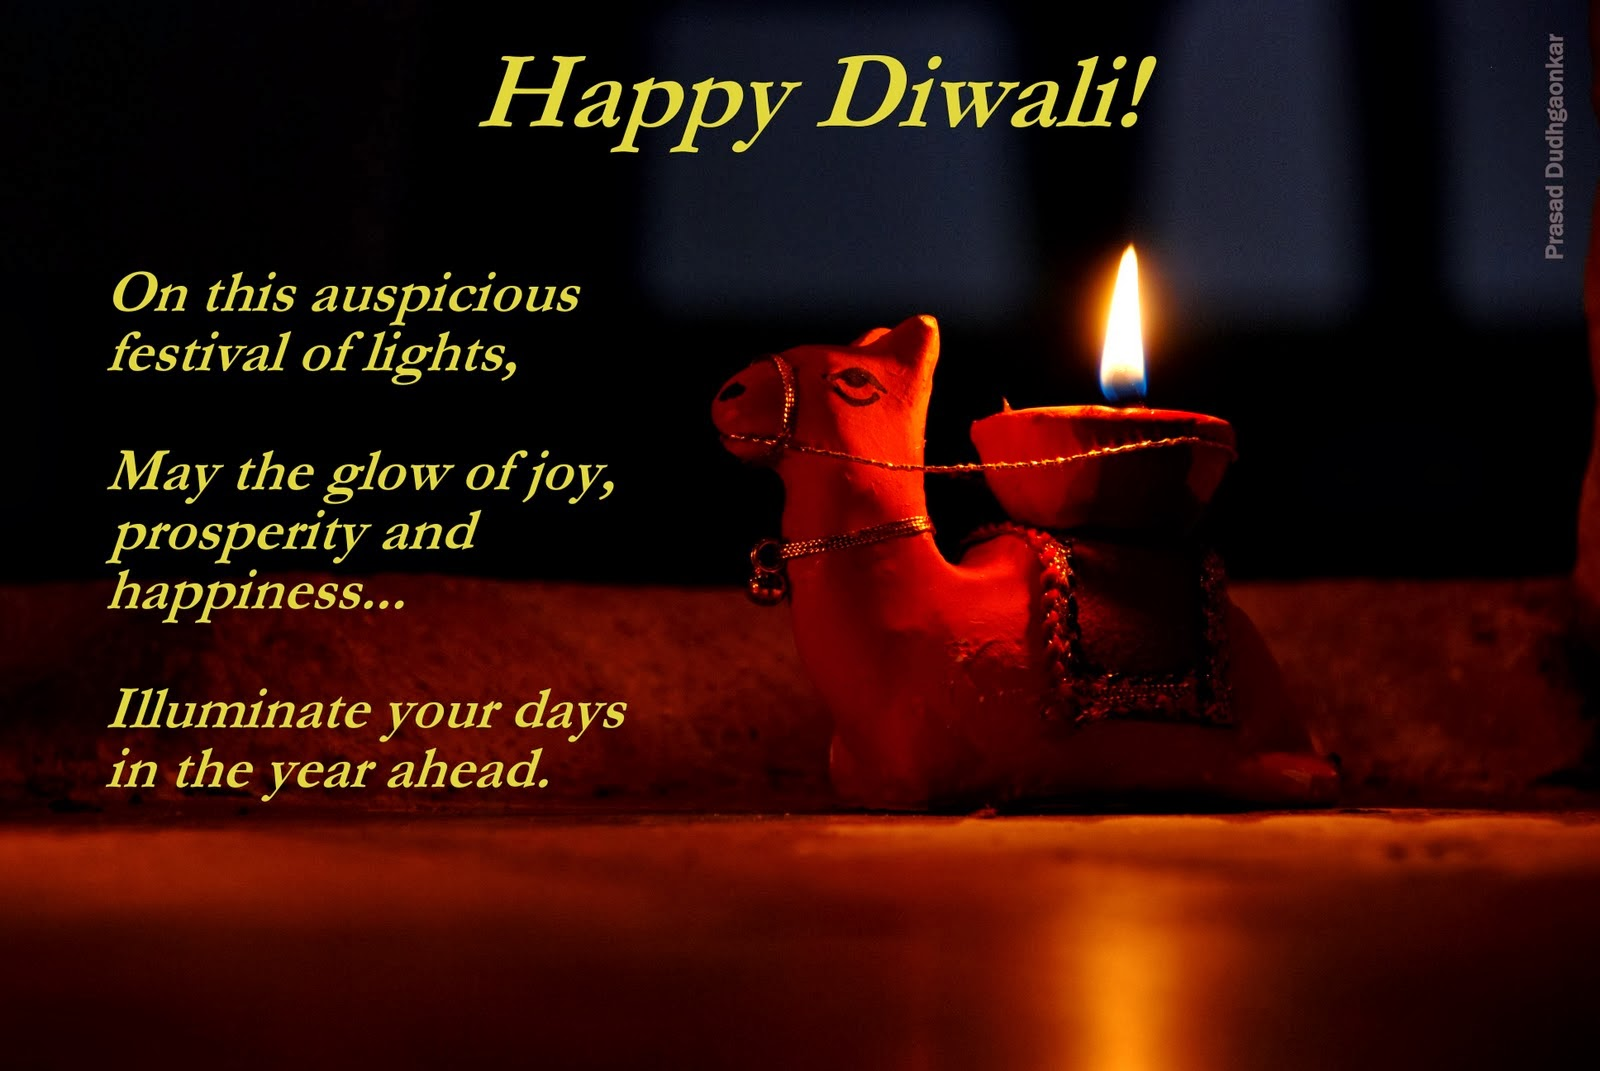 Diwali Greetings Diwali 2017 Greeting Cards Collection 2017